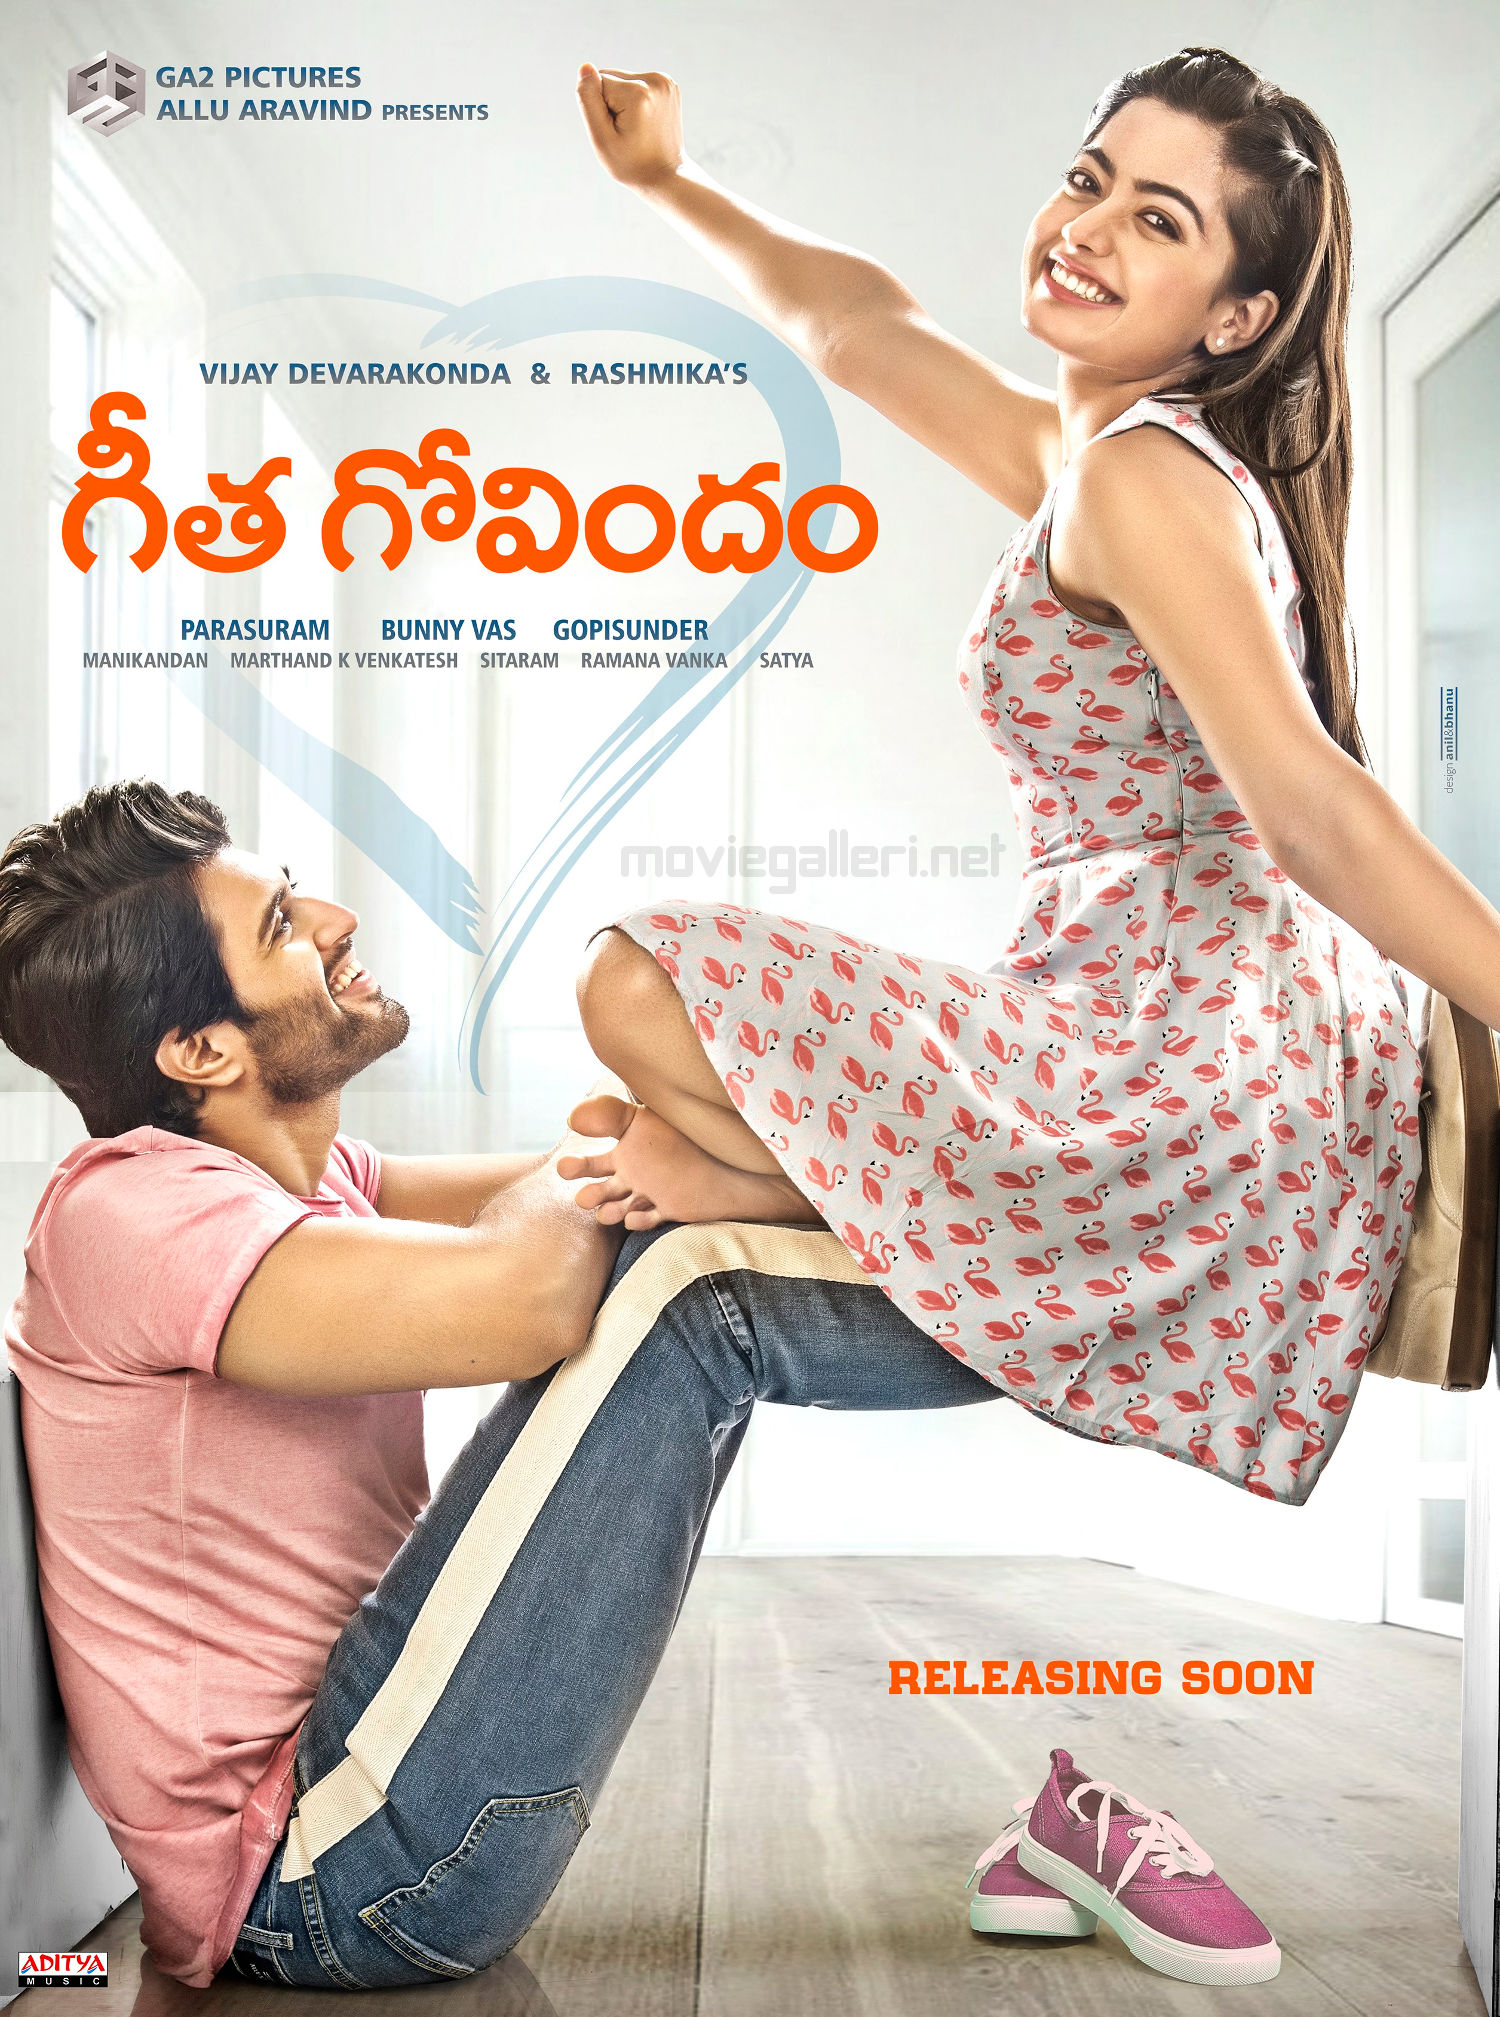 Vijay Devarakonda Rashmika Mandanna Geetha Govindam First Look Poster HD